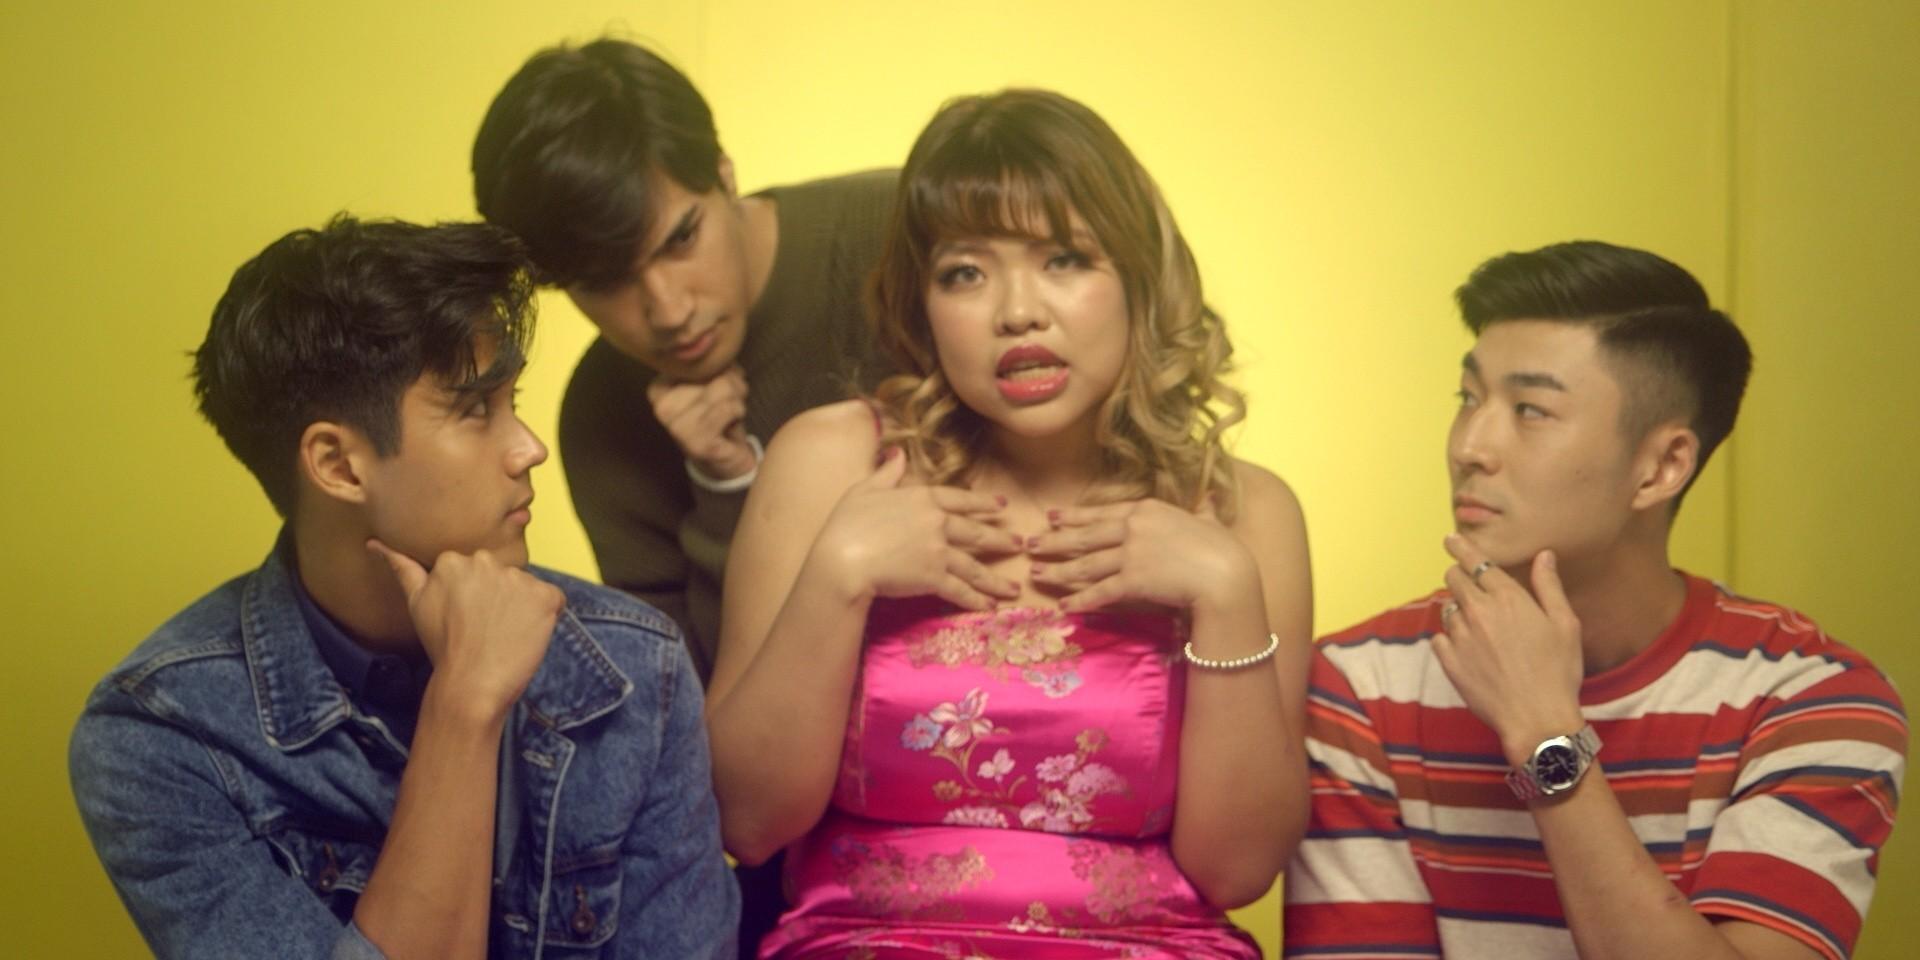 PREMIERE: Ysa Yaneza's music video for 'Max' celebrates Asian beauty